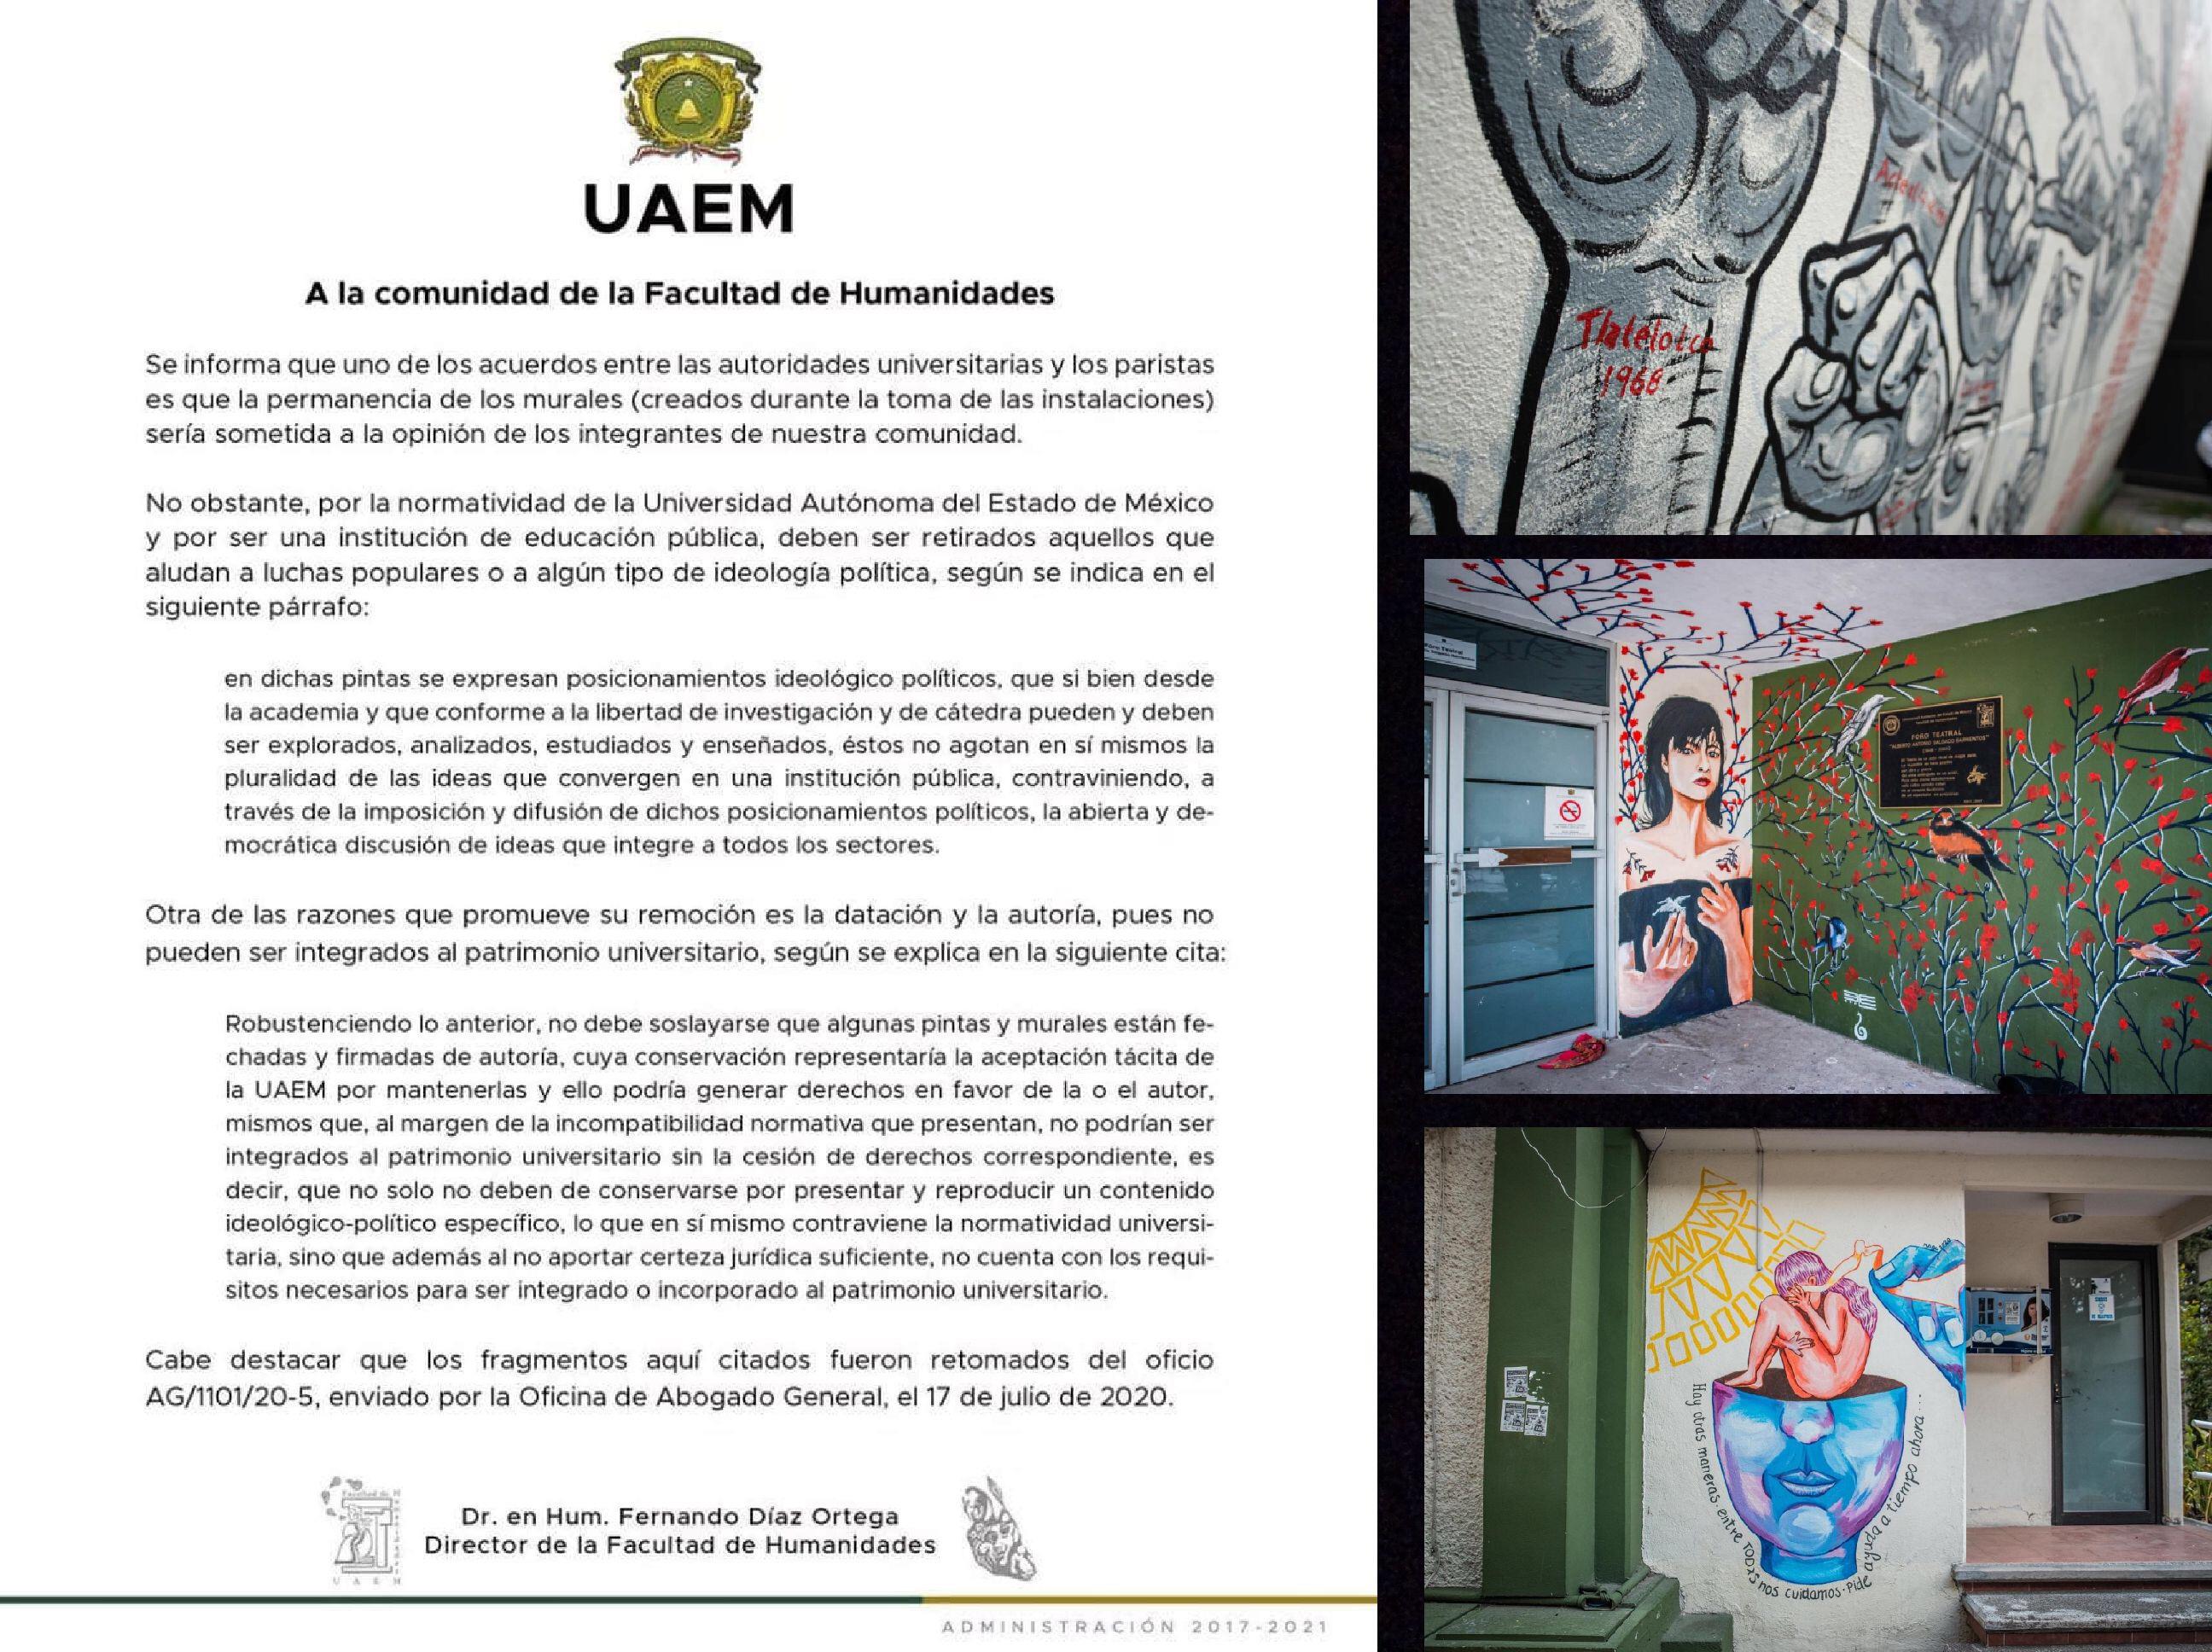 Murales de Humanidades desatan discordia en UAEM